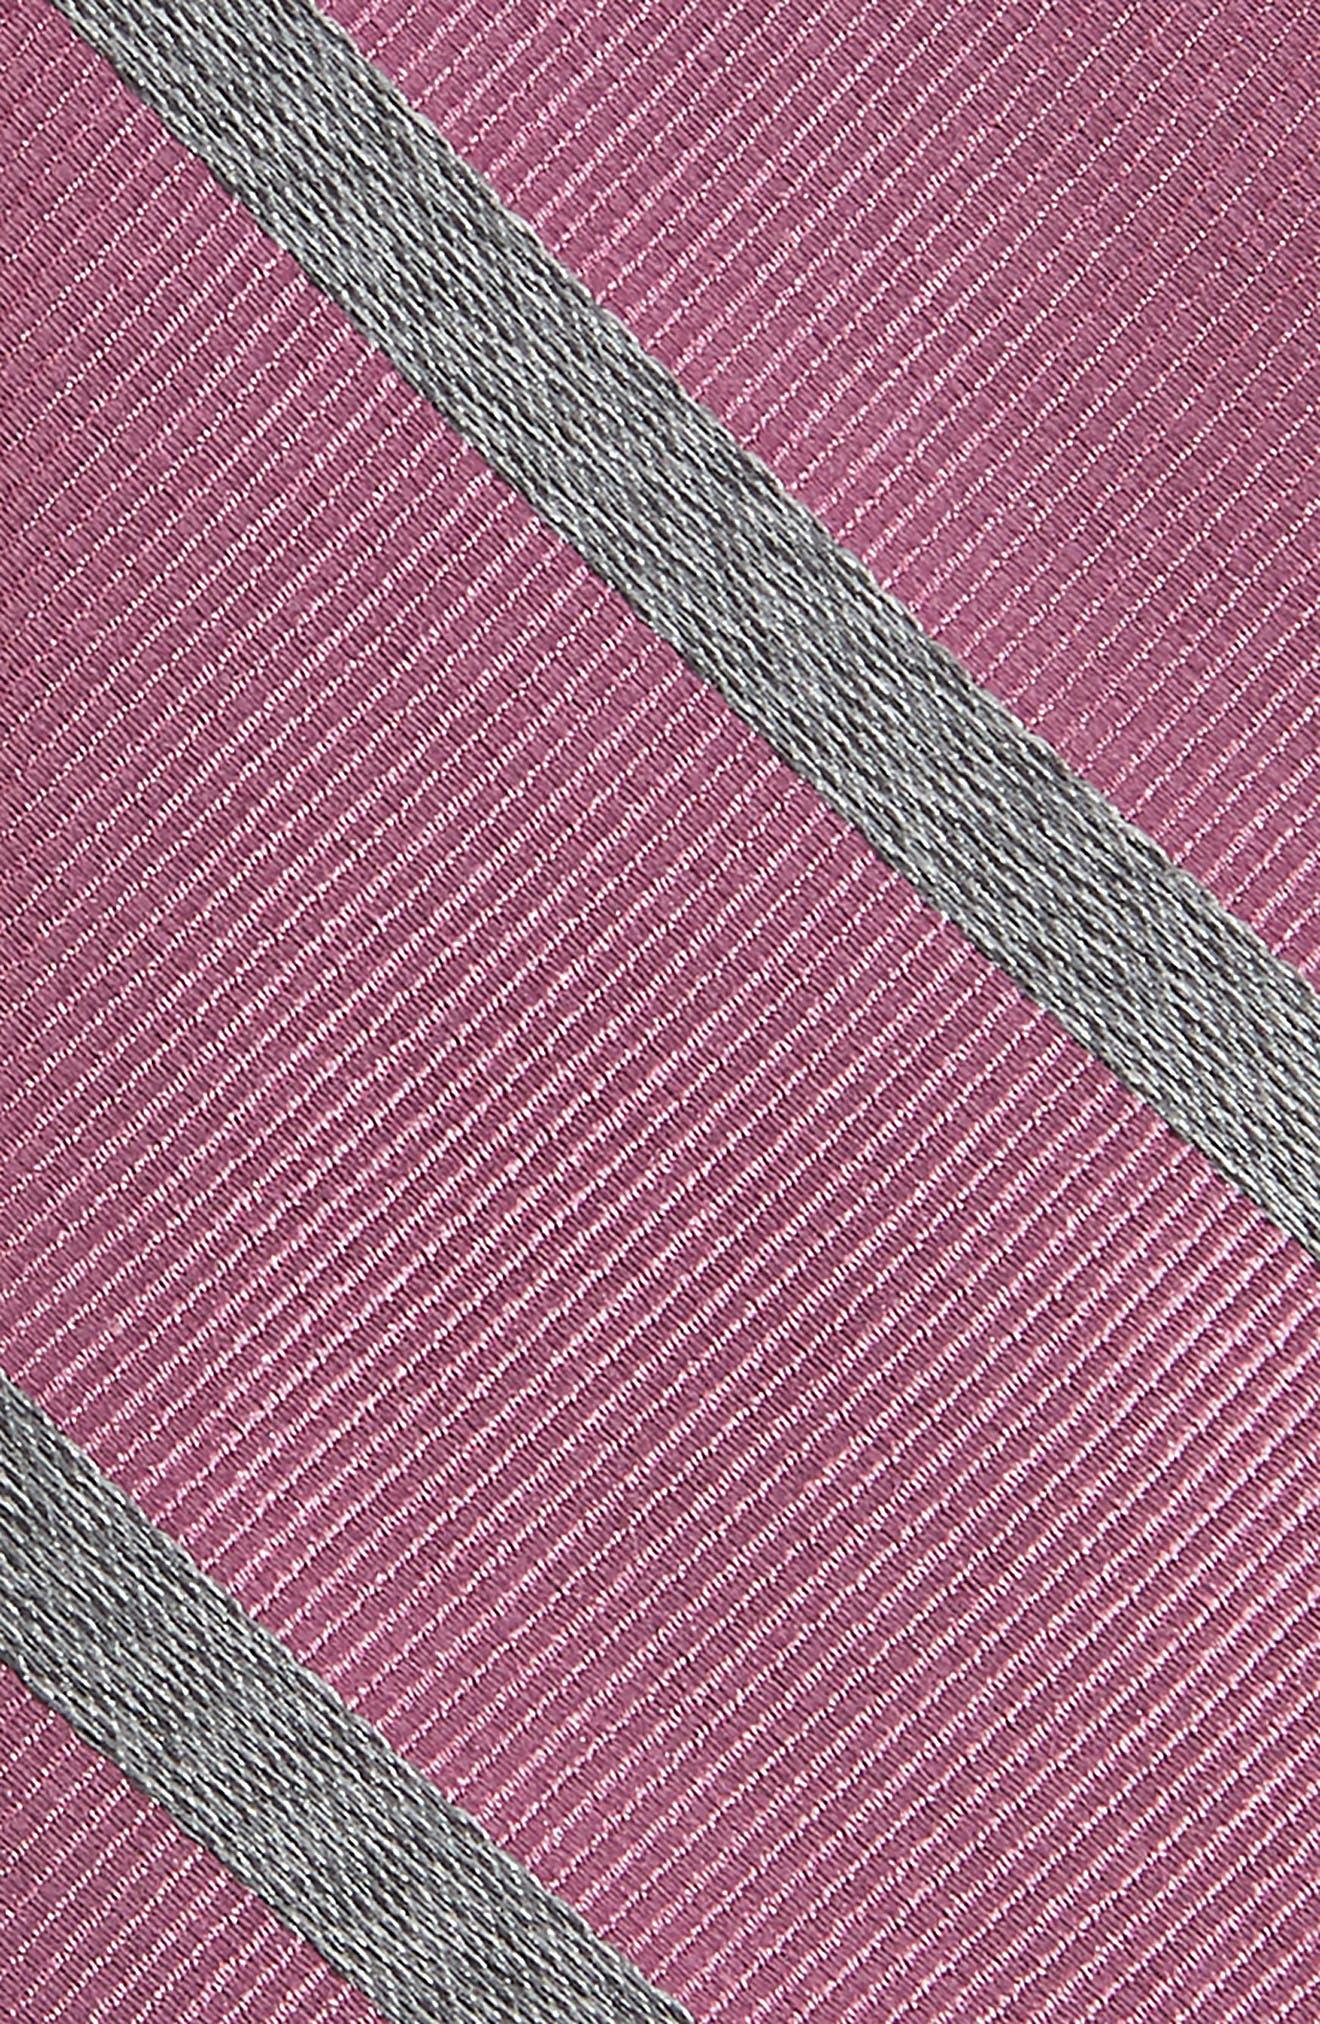 Wheelhouse Stripe Silk Tie,                             Alternate thumbnail 2, color,                             Dusty Rose